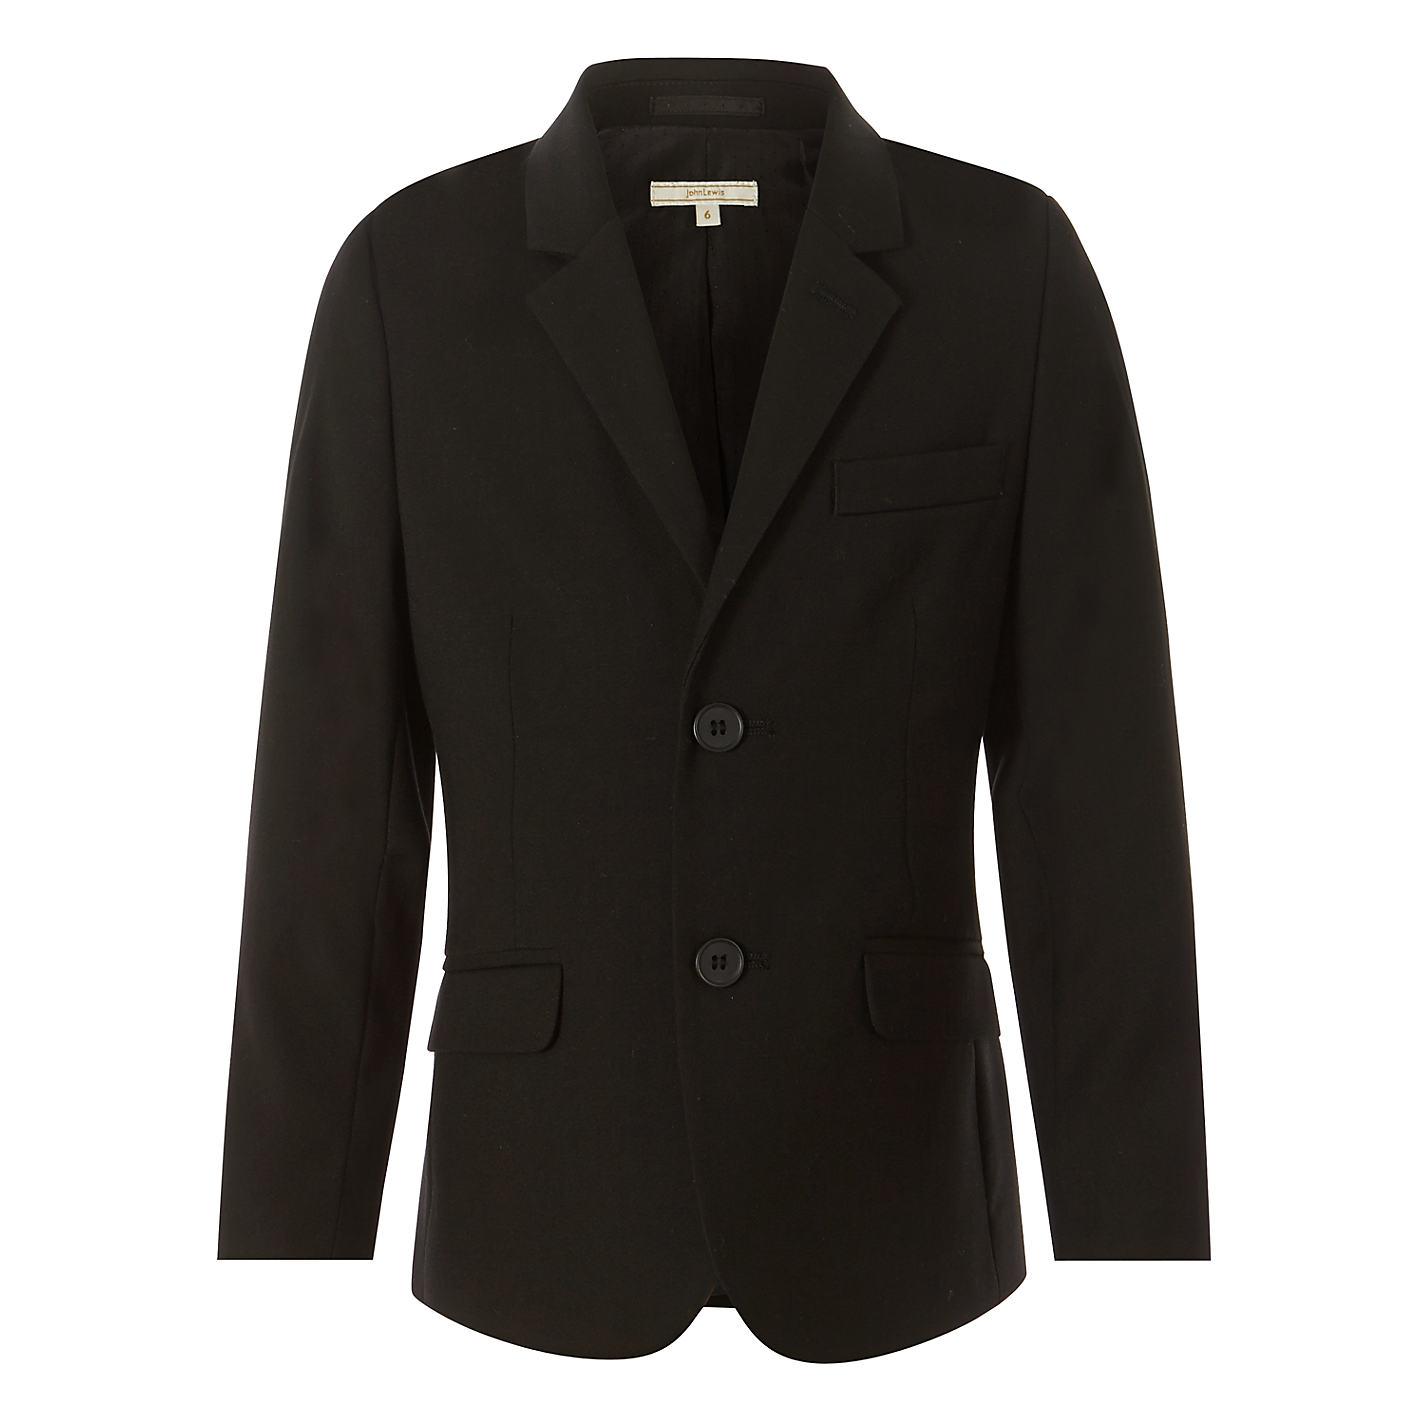 Buy John Lewis Heirloom Collection Boys' Suit Jacket, Black | John ...